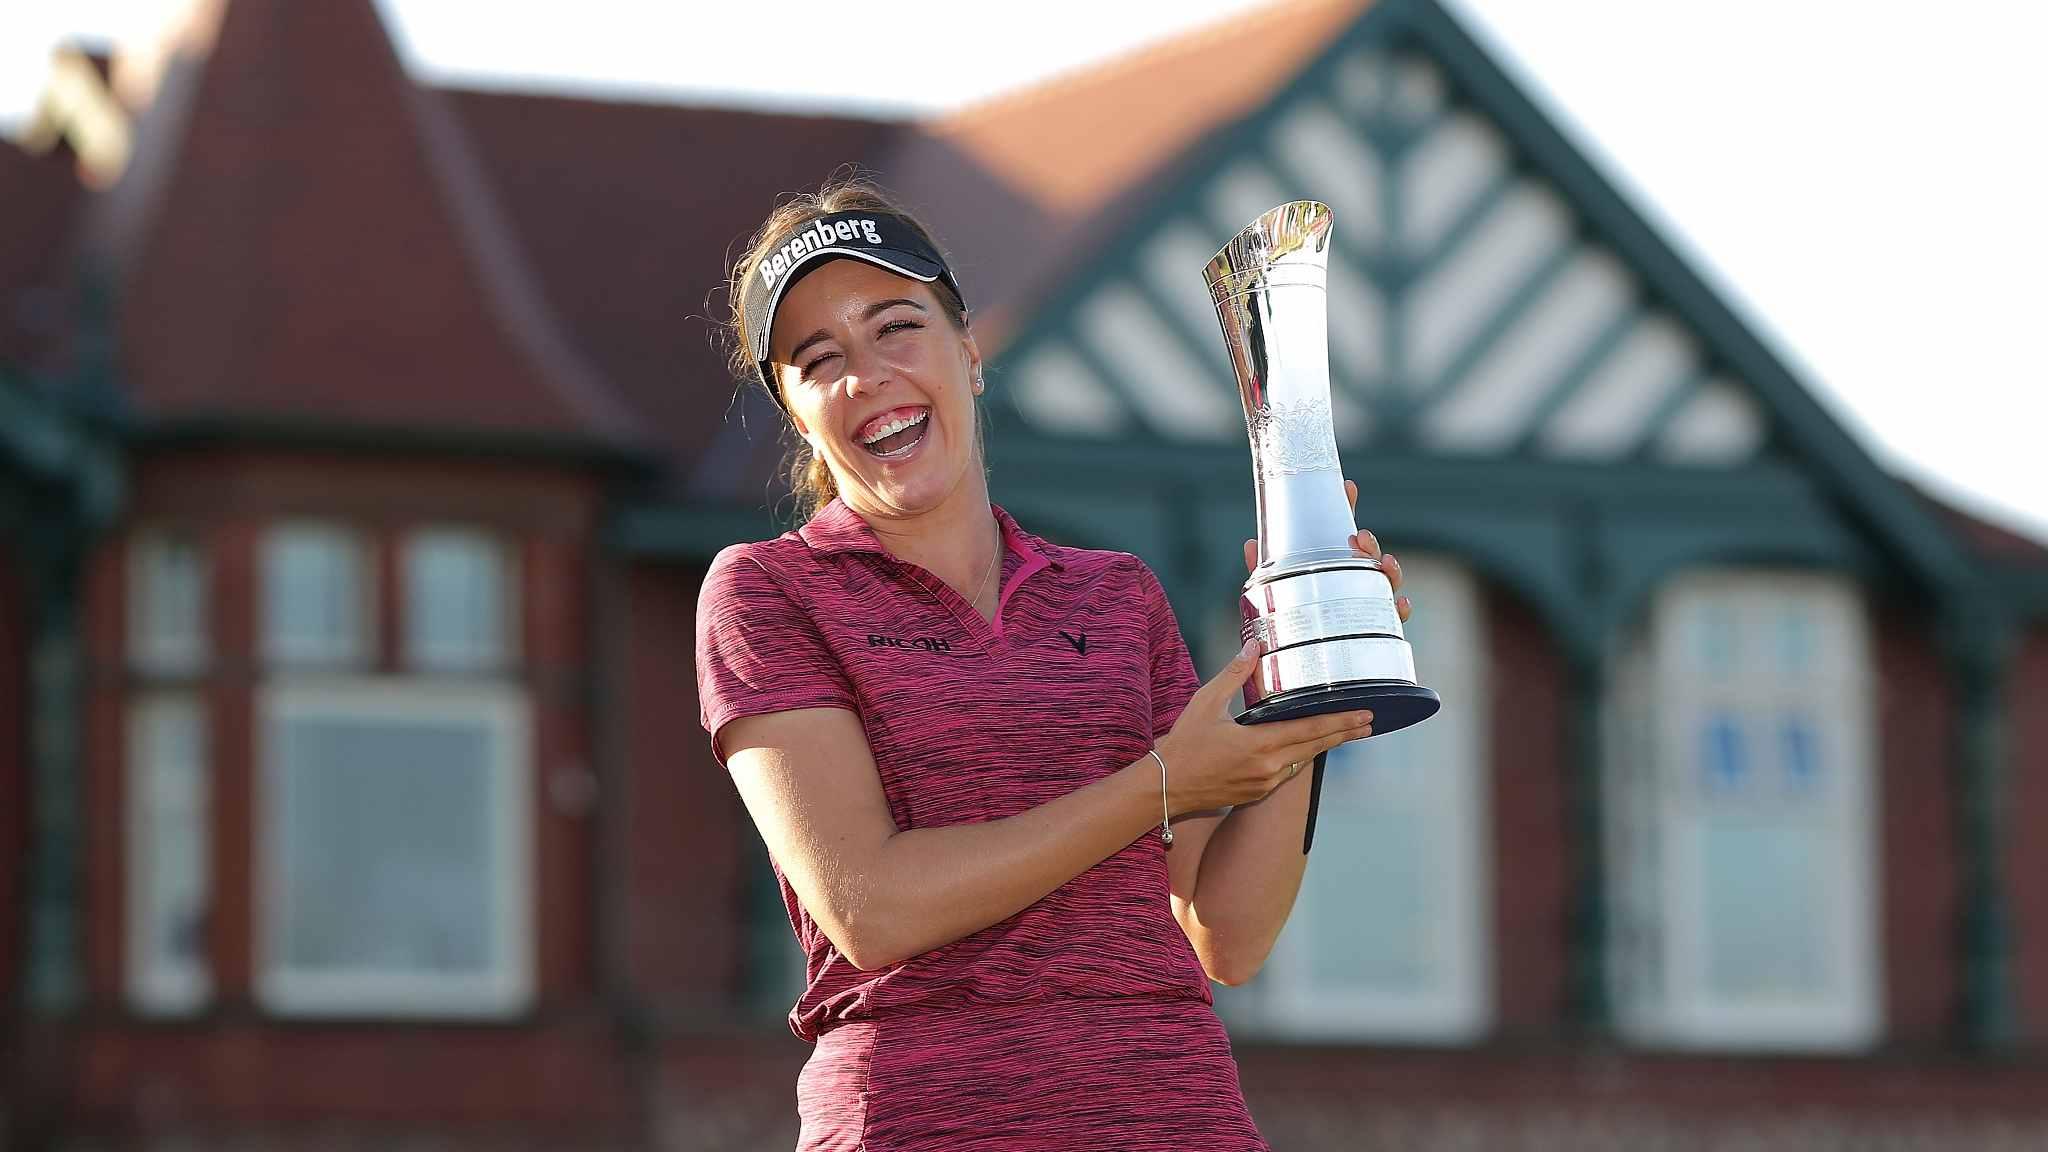 English golfer Georgia Hall wins women's British Open